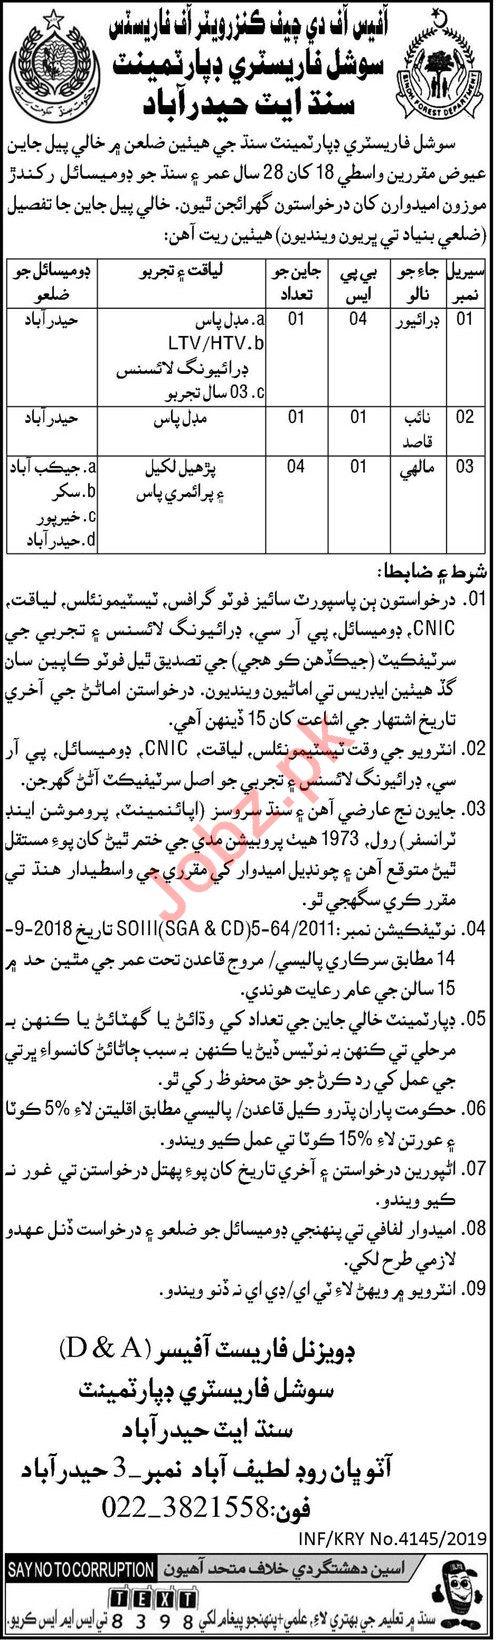 Social Forestry Department Jobs for Drivers & Naib Qasid